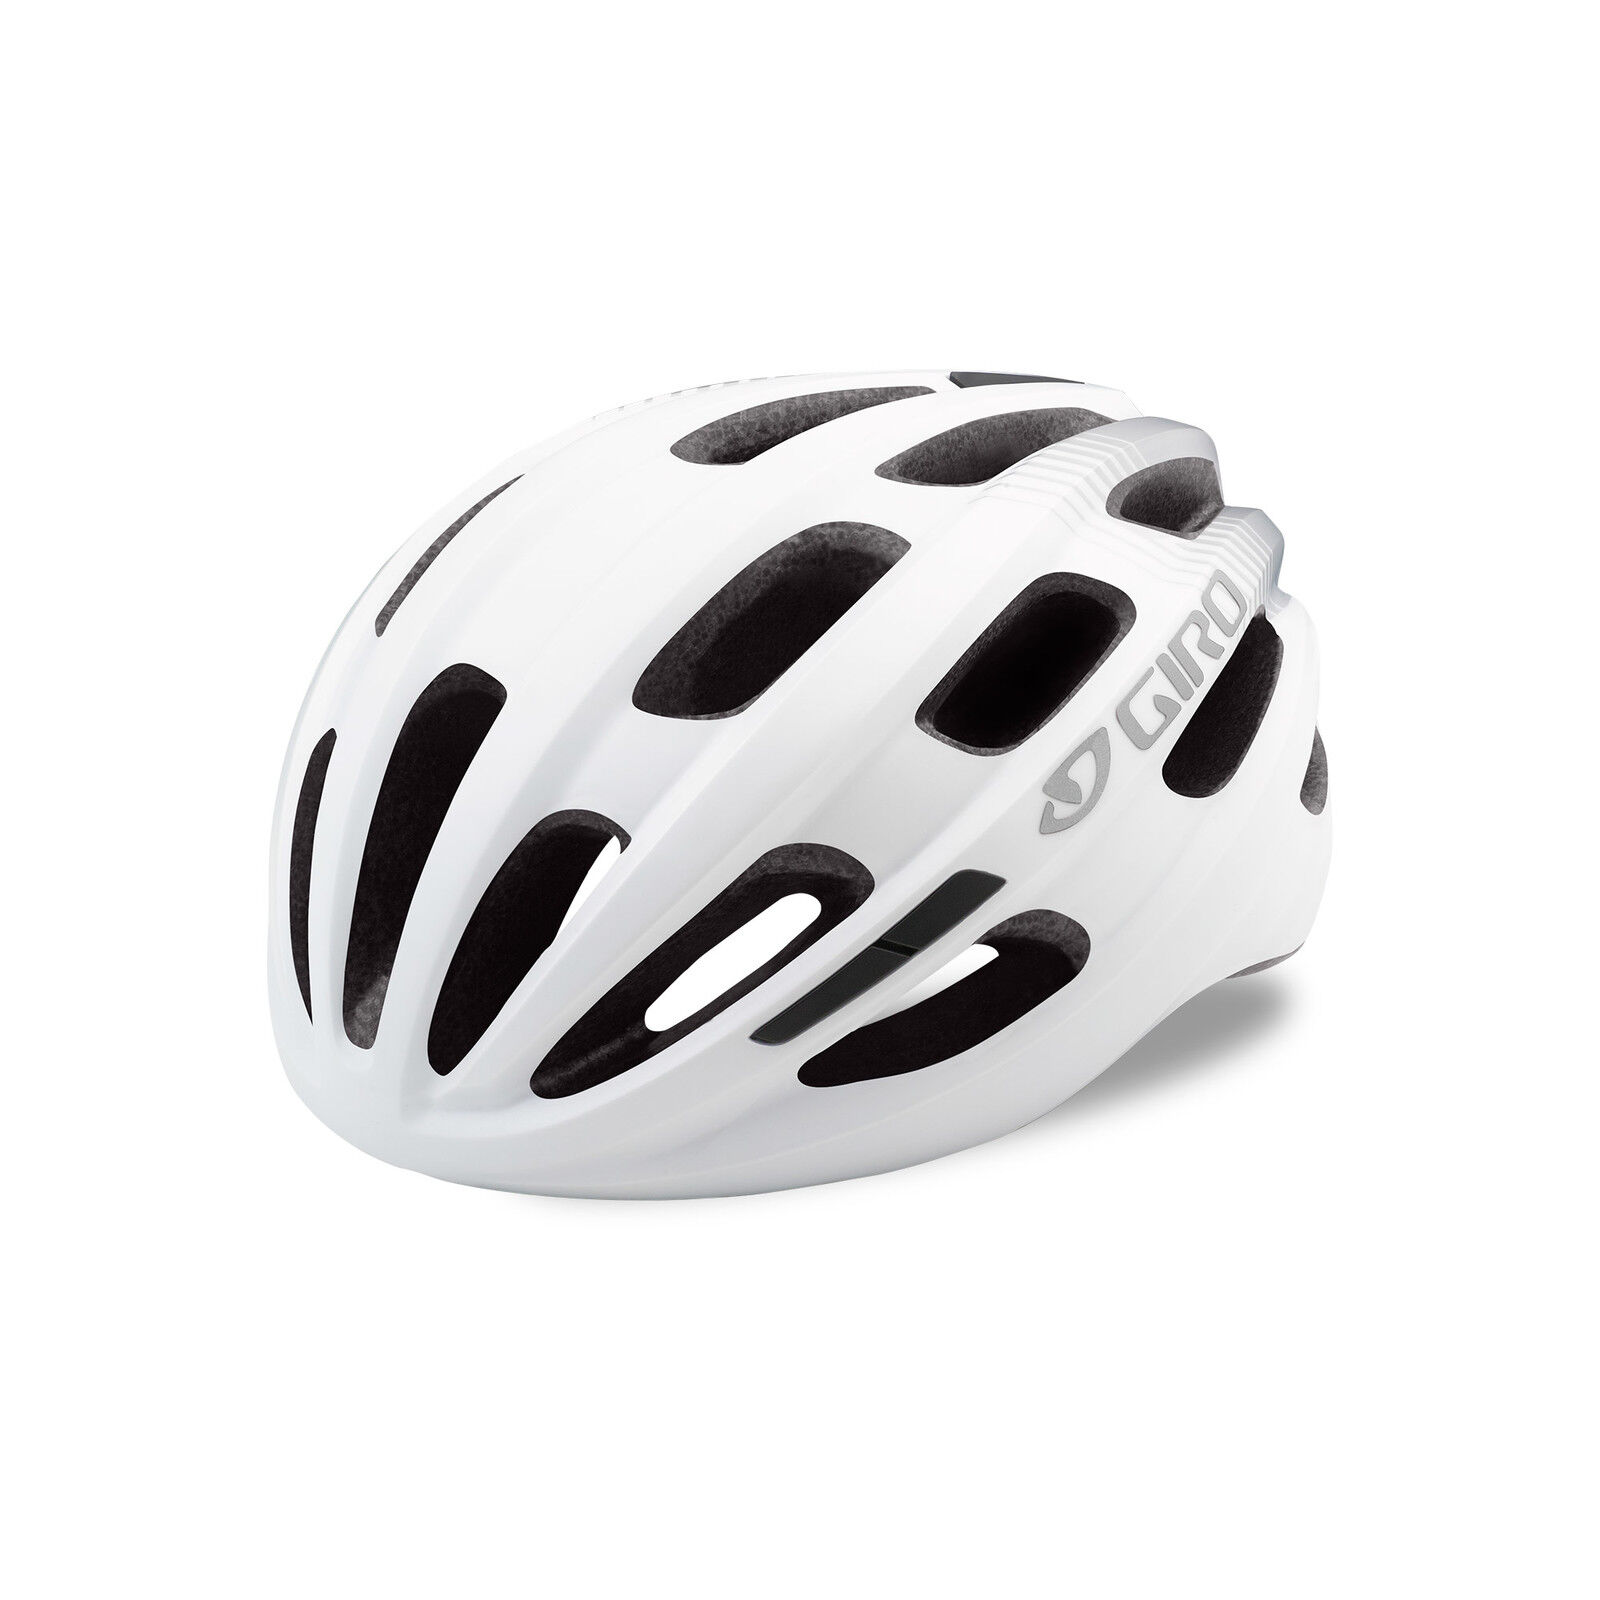 Giro isode MIPS Casco bicicletta TG 5461cm BIANCO 2019